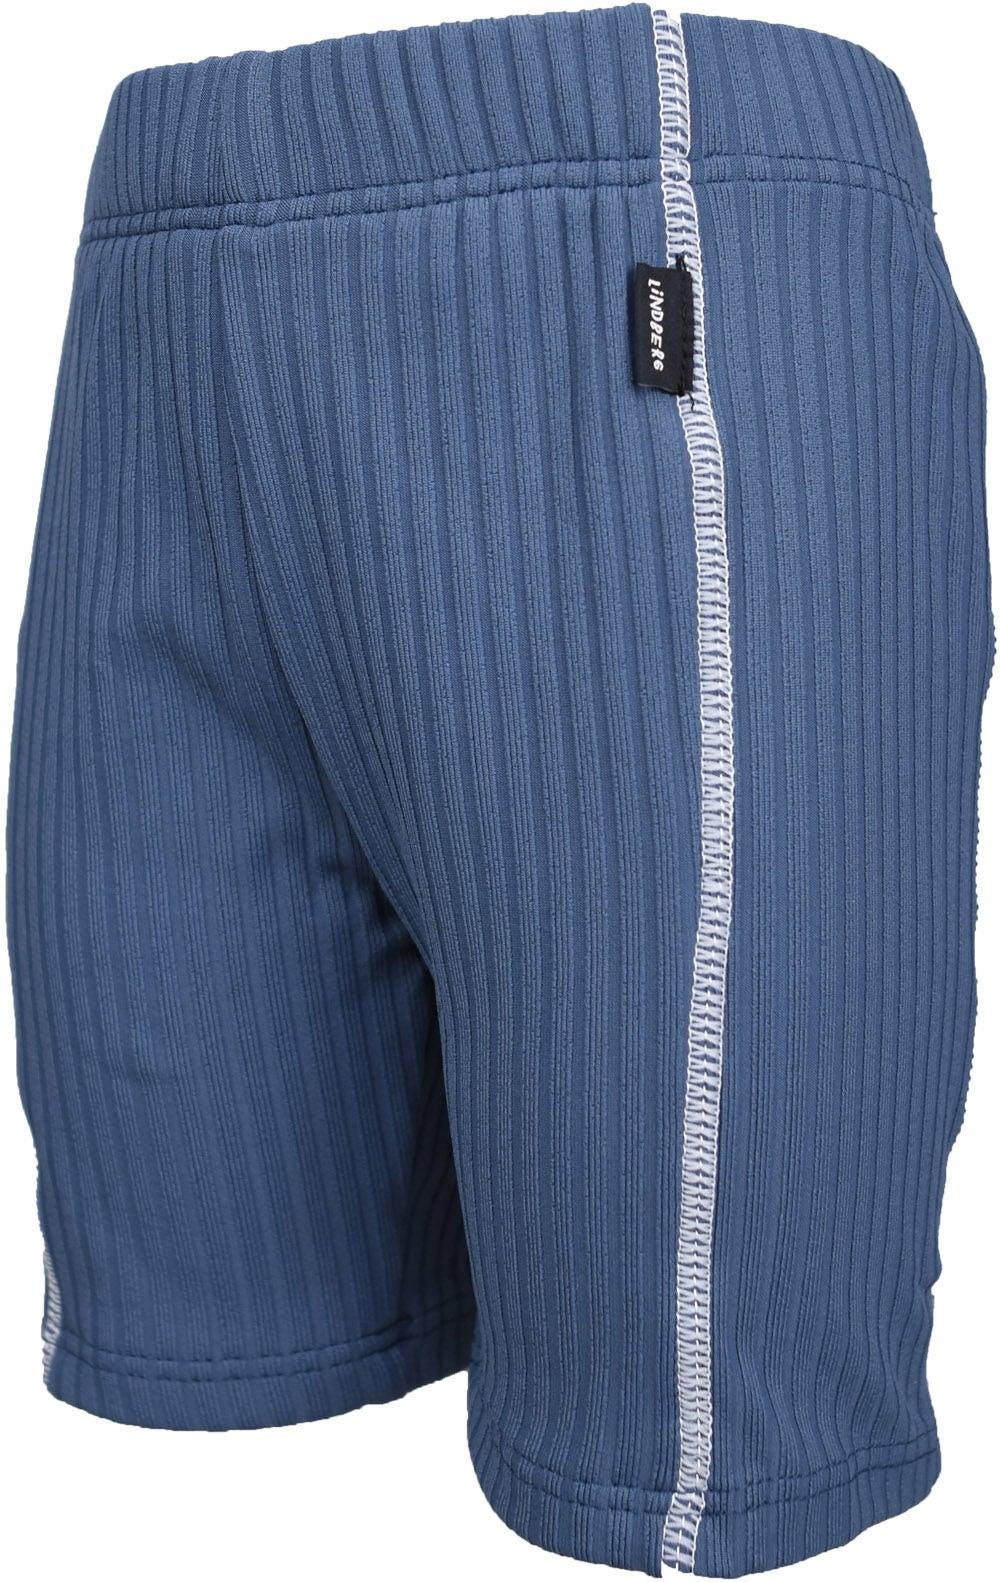 Lindberg Palermo UV-Shorts UPF50+, Petroleum, 74/80